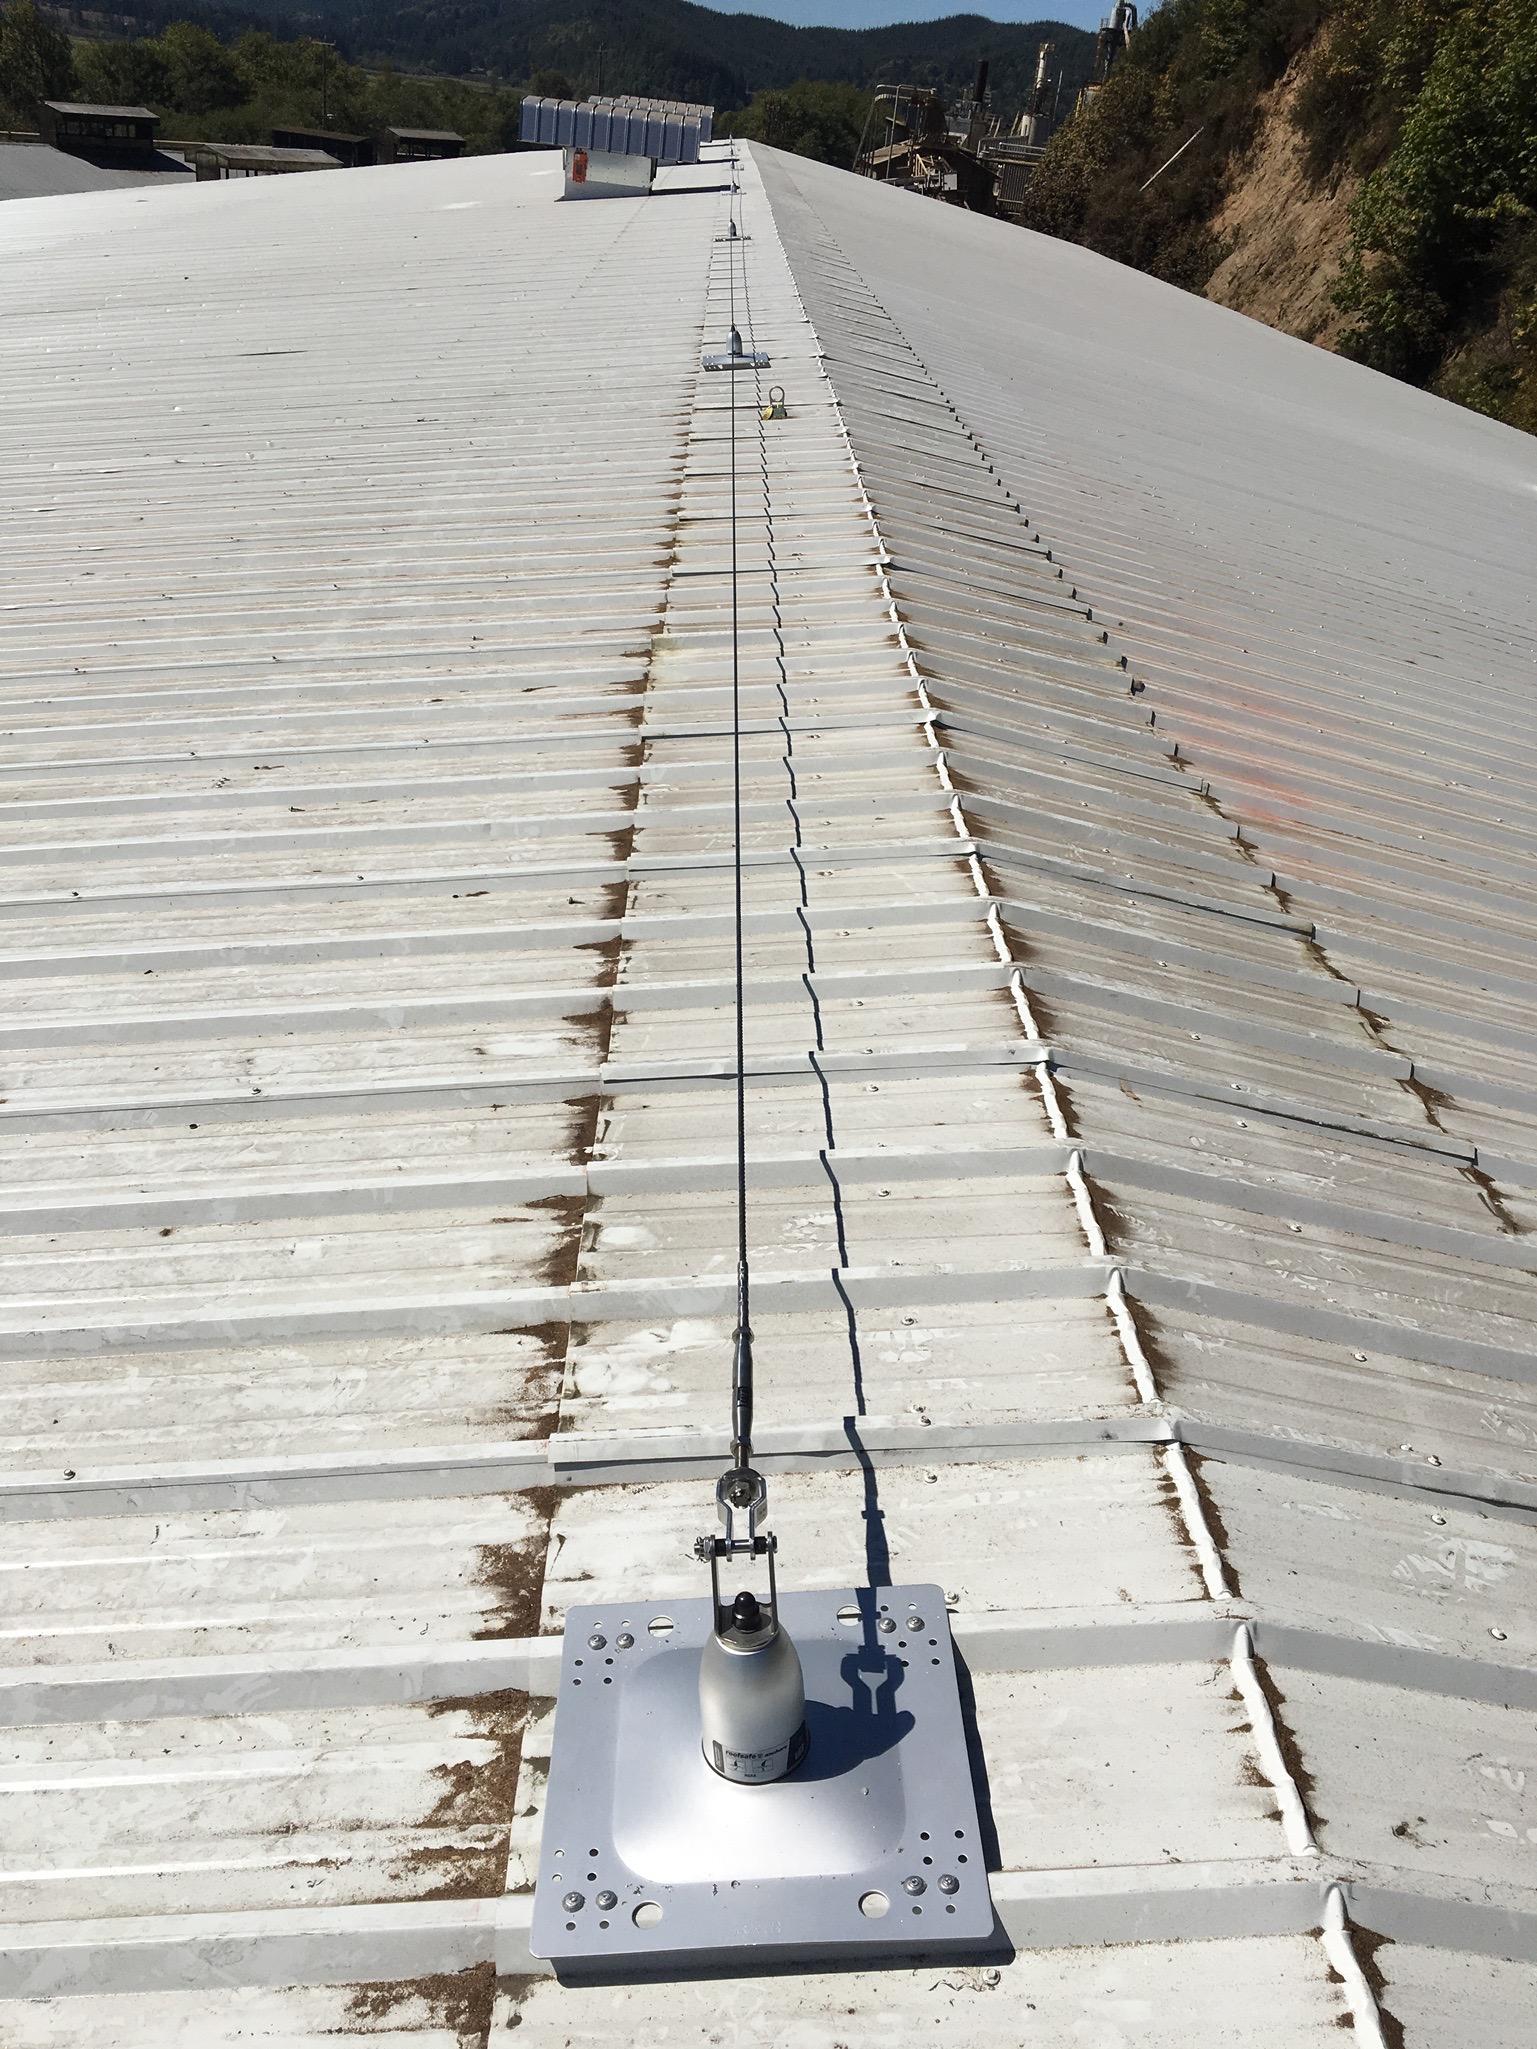 Horizontal lifeline for maintenance workers